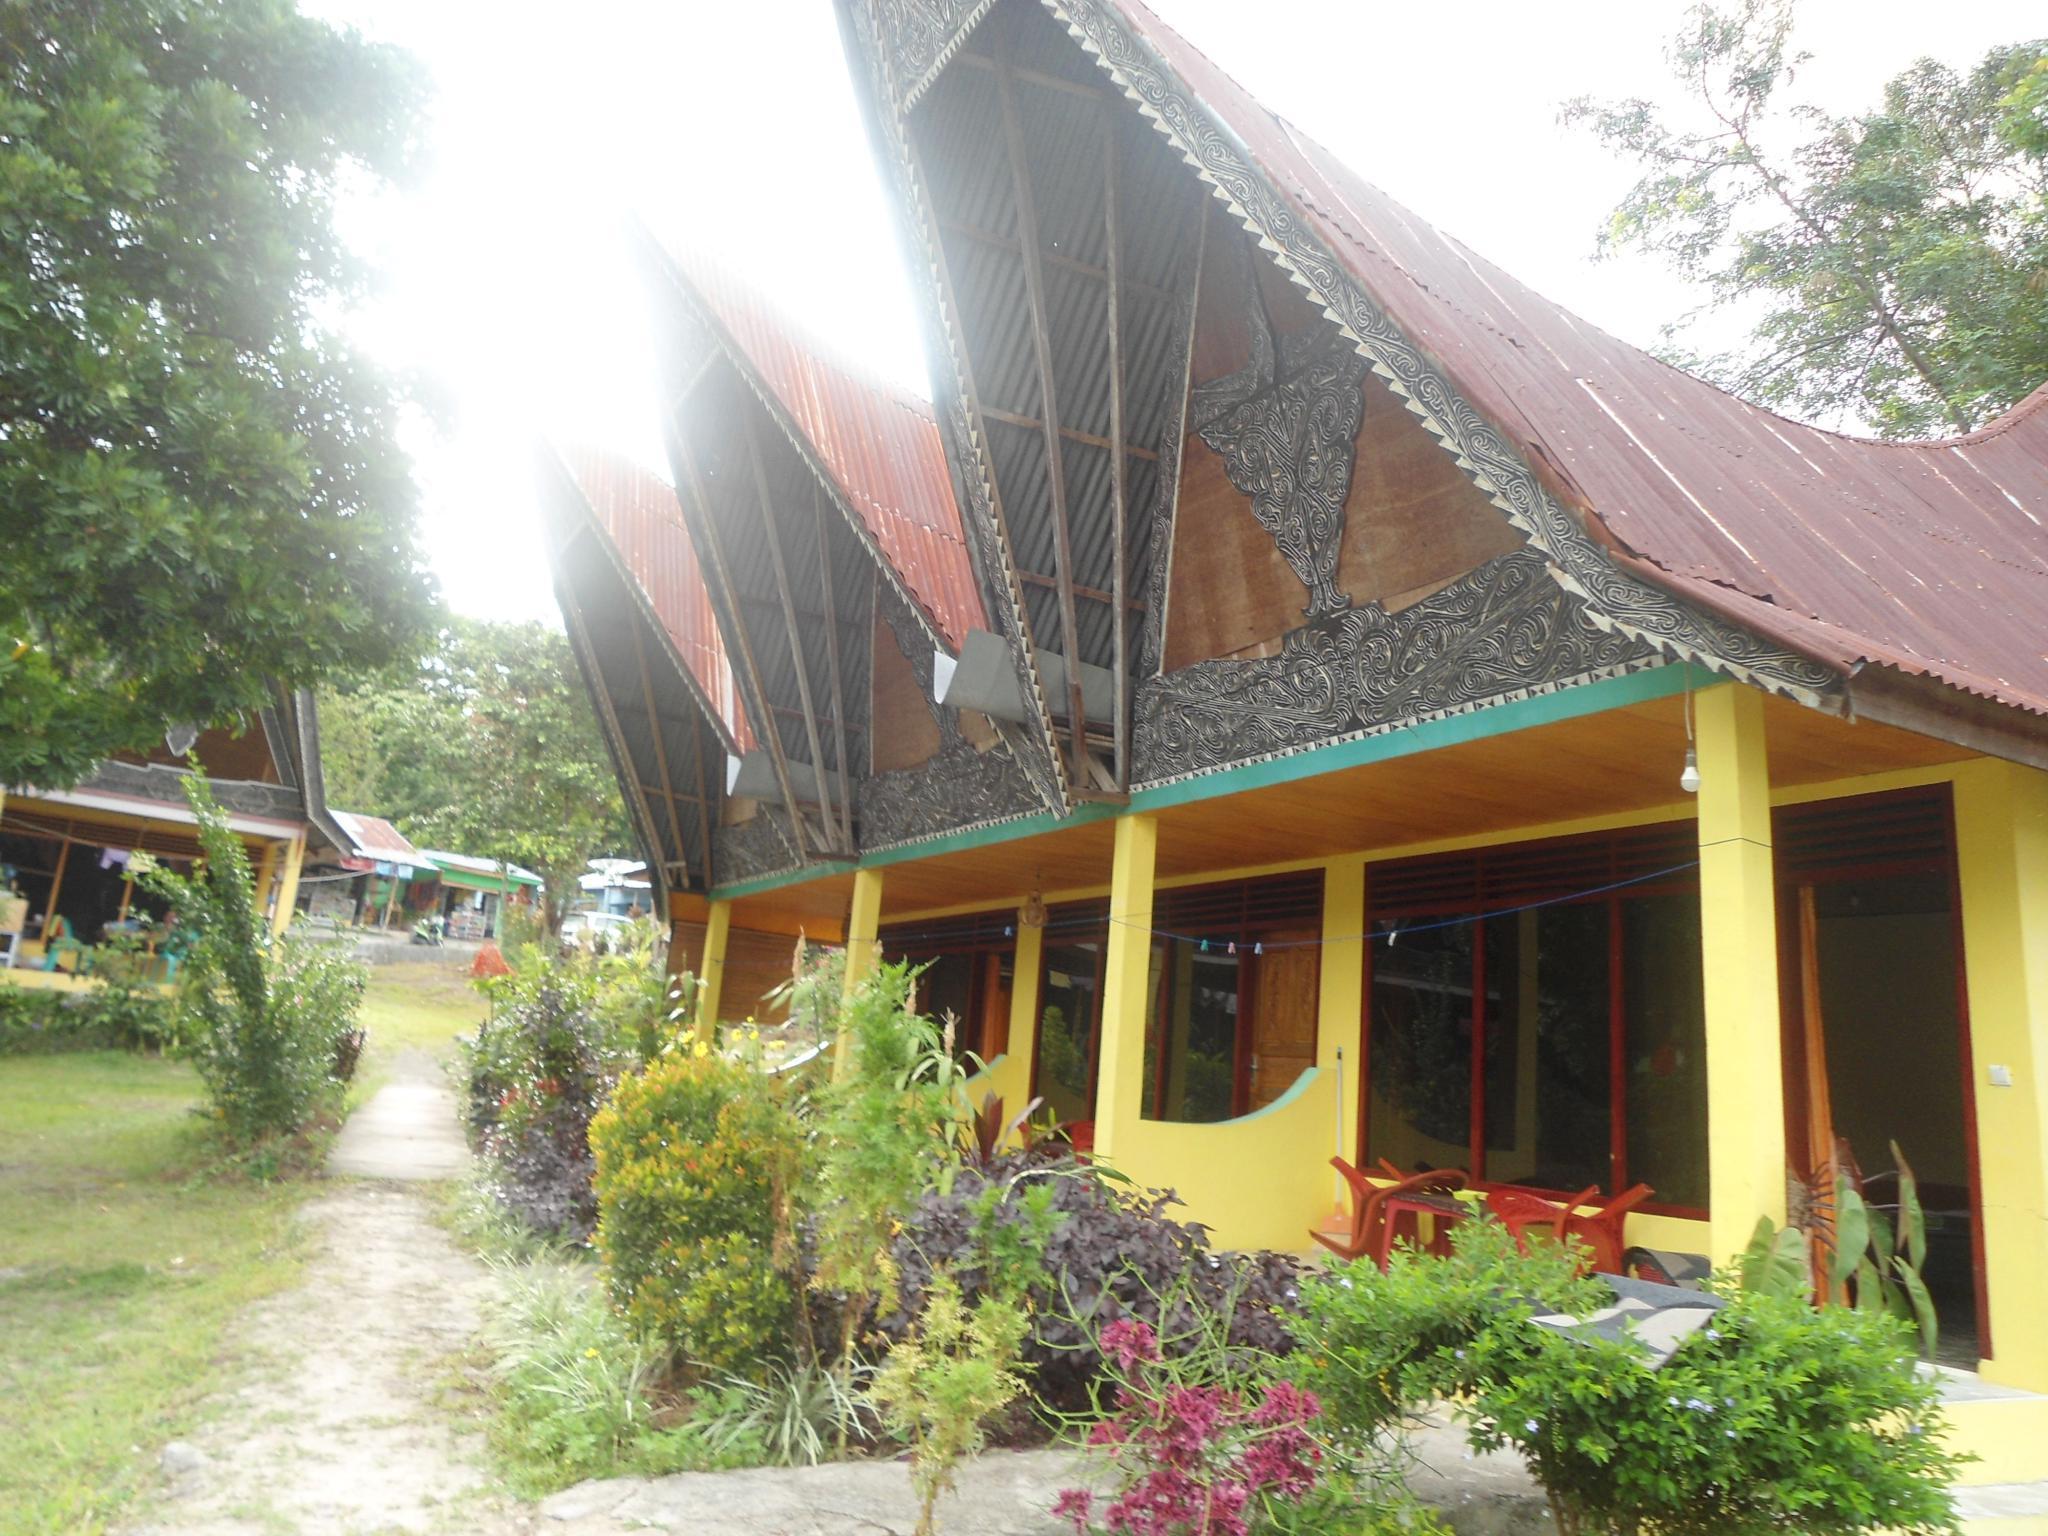 Matahari Guesthouse & Restaurant, Samosir